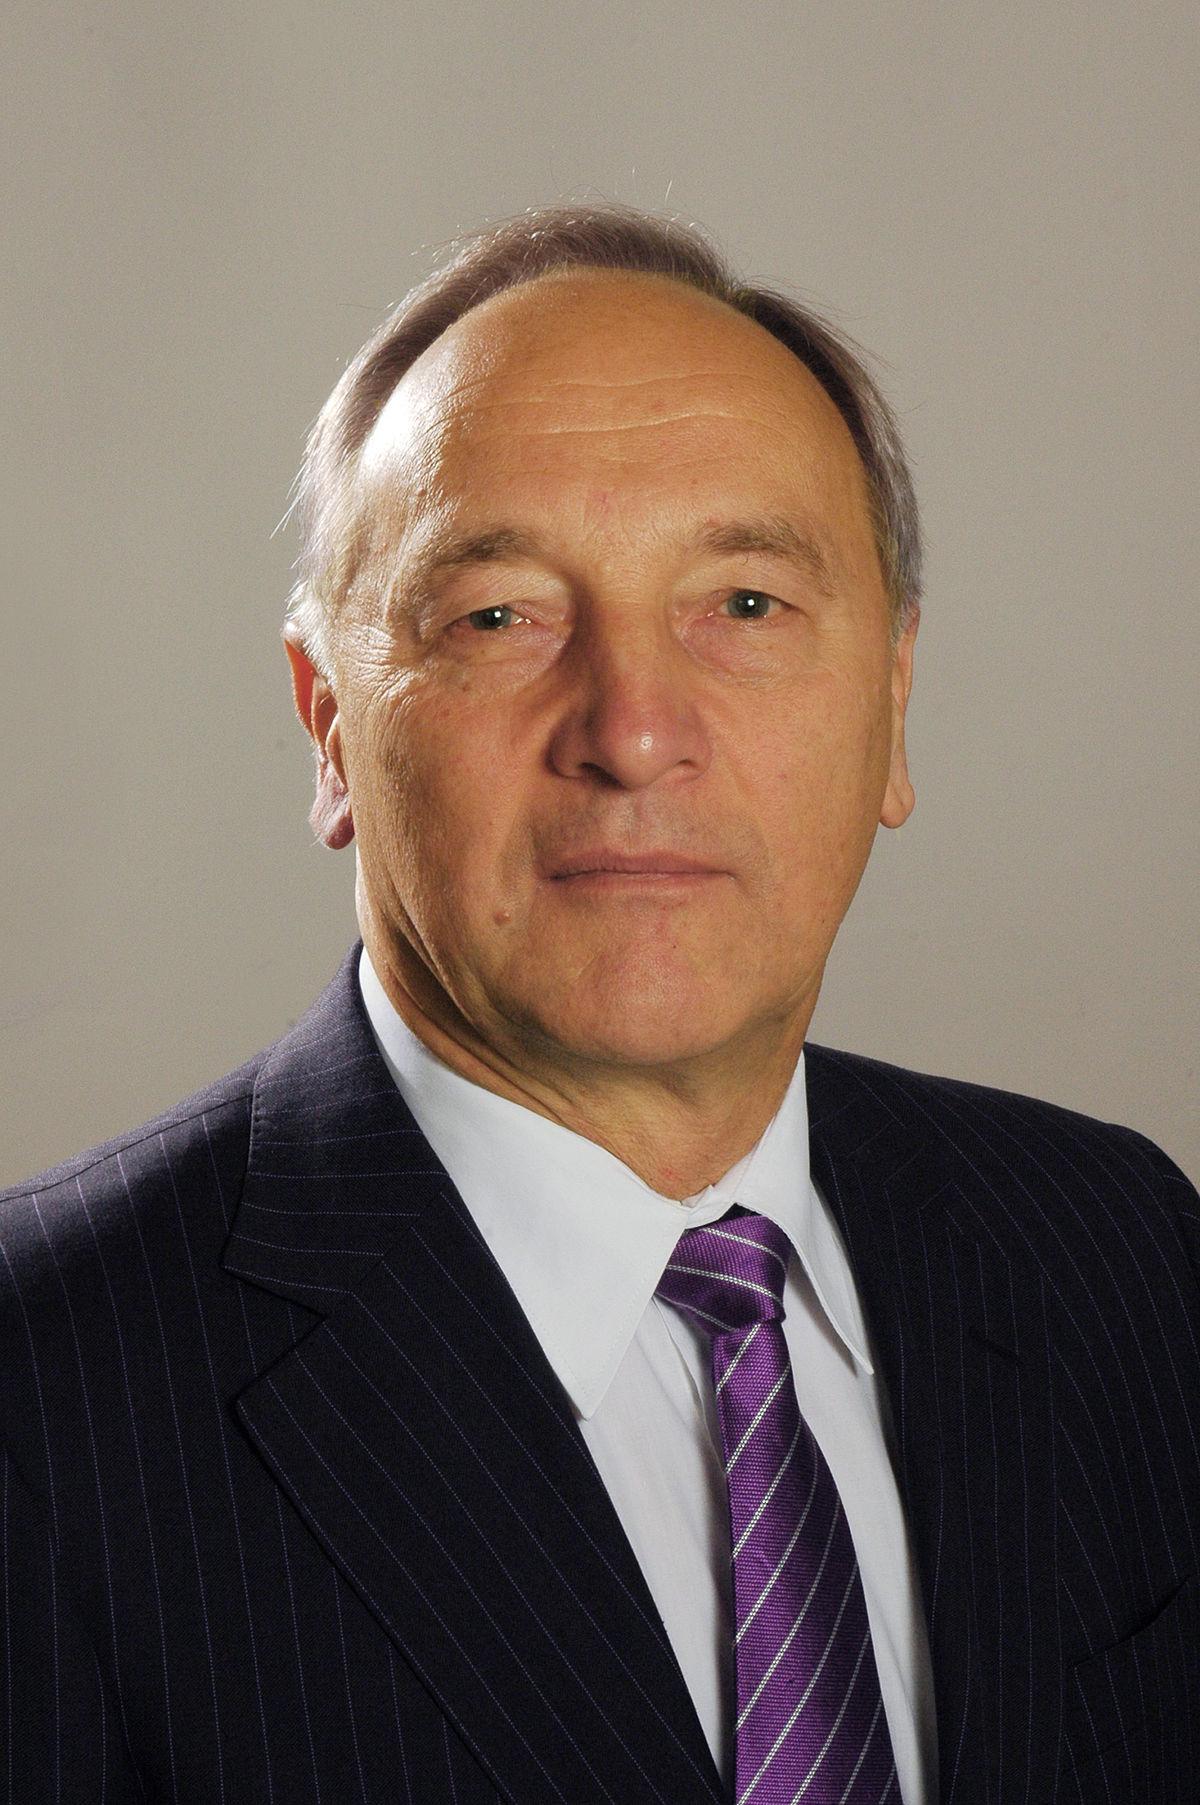 Andris Bērziņš (Latvian President) - Wikipedia